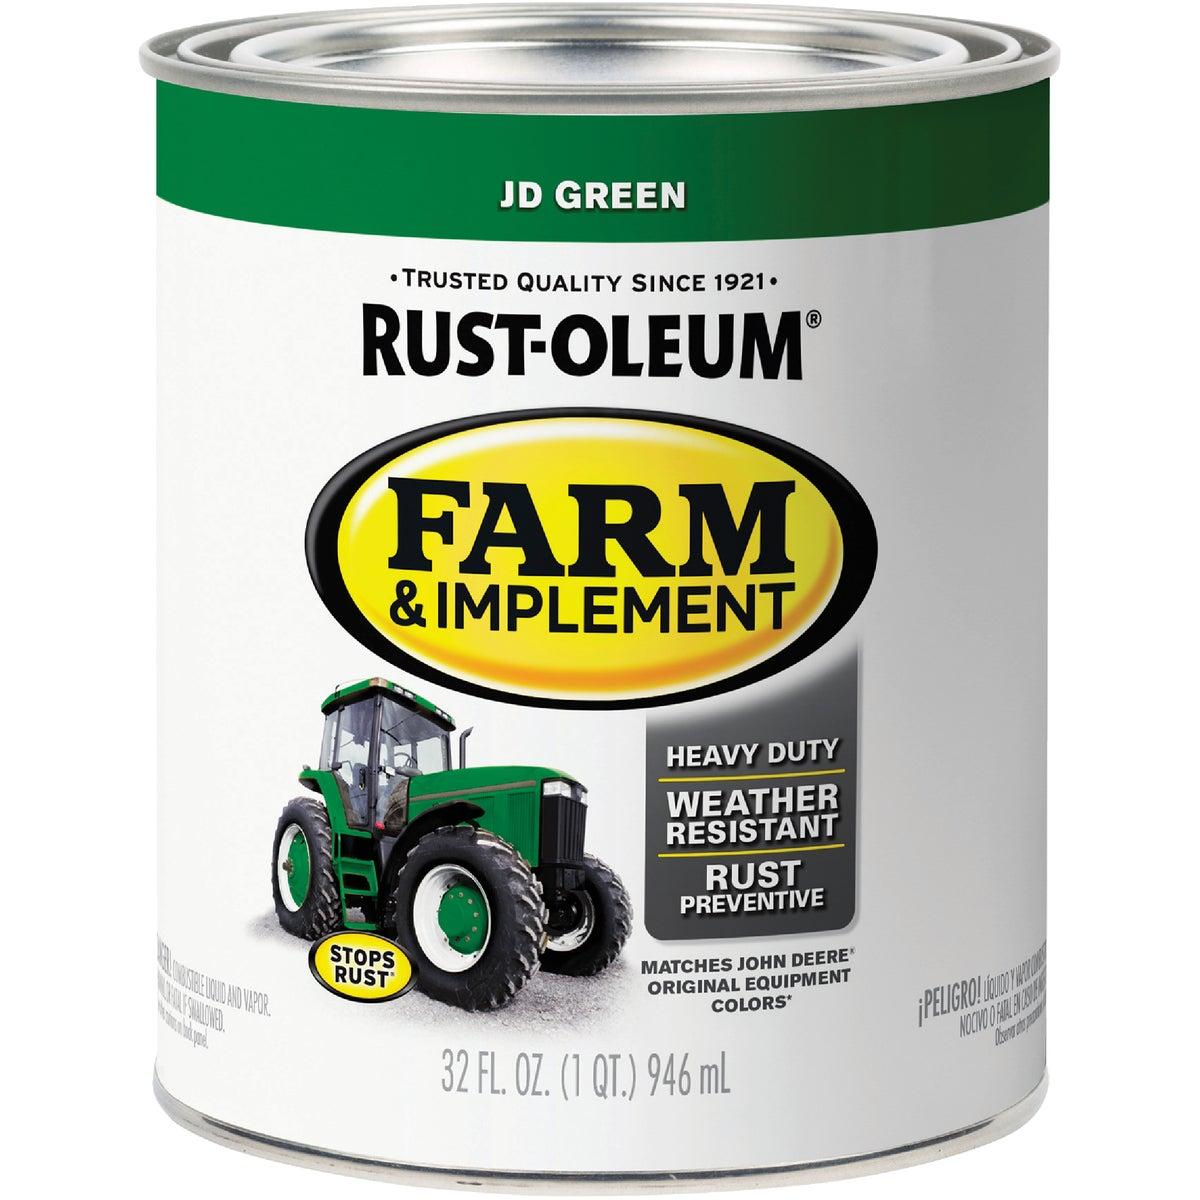 Rust Oleum JD GREEN IMPLEMNT ENAMEL 7435-502